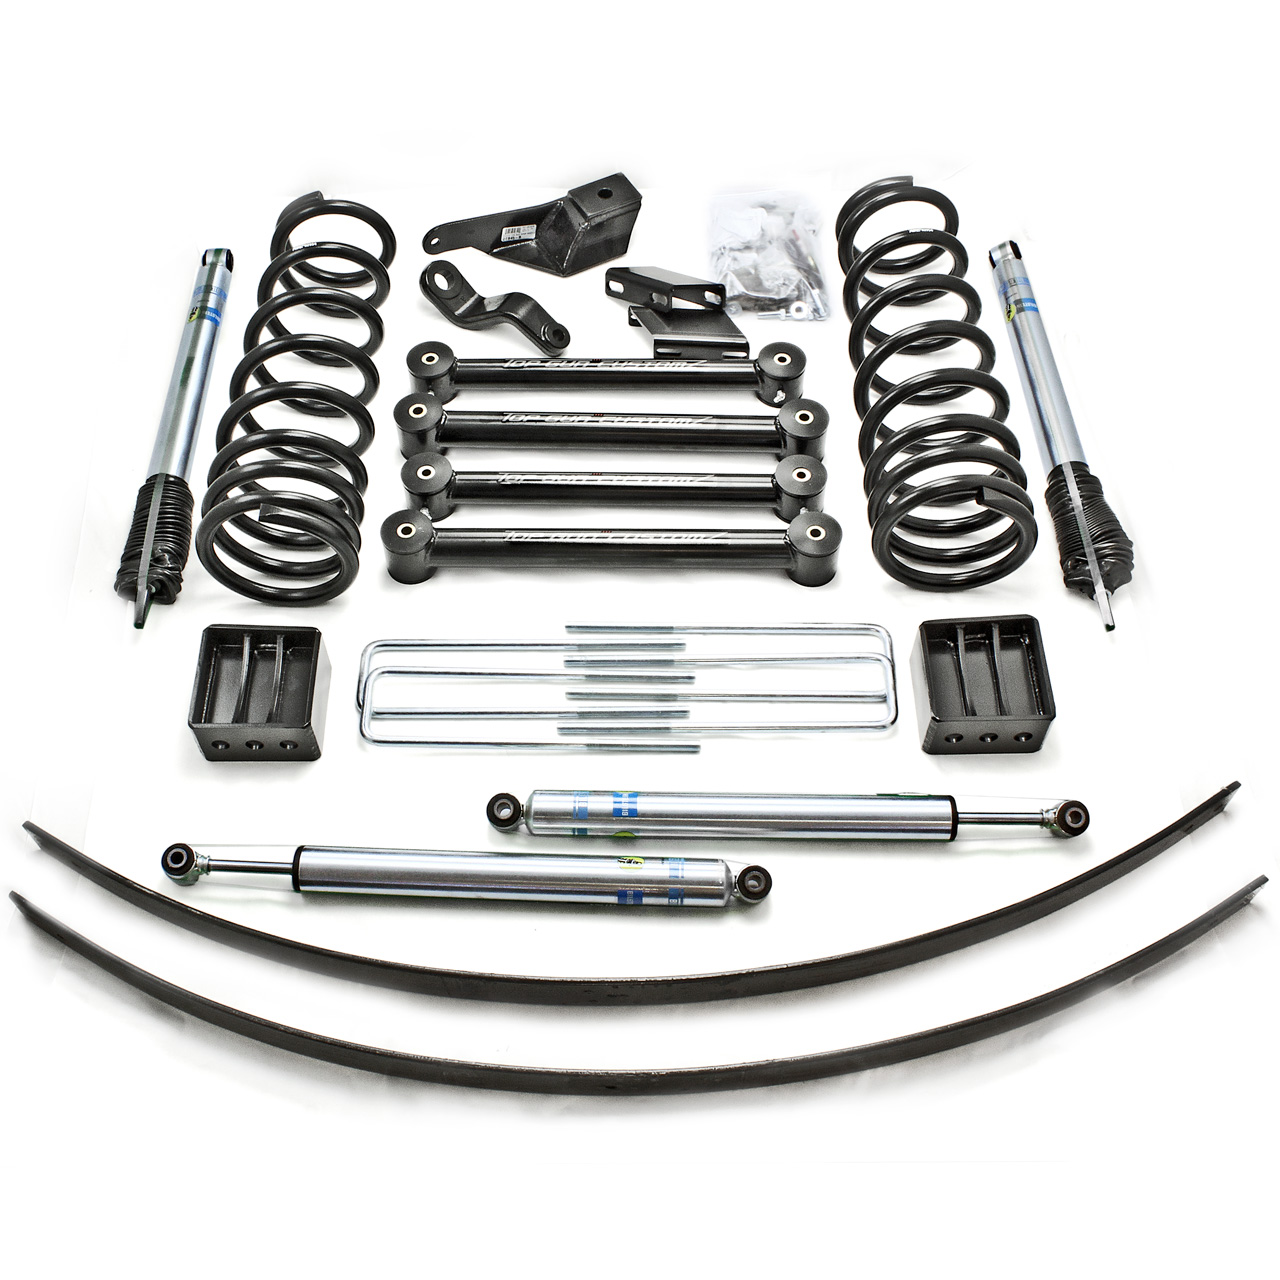 Dodge Lift Kit For 2002 Dodge Ram 3500 Truck Lift Kits